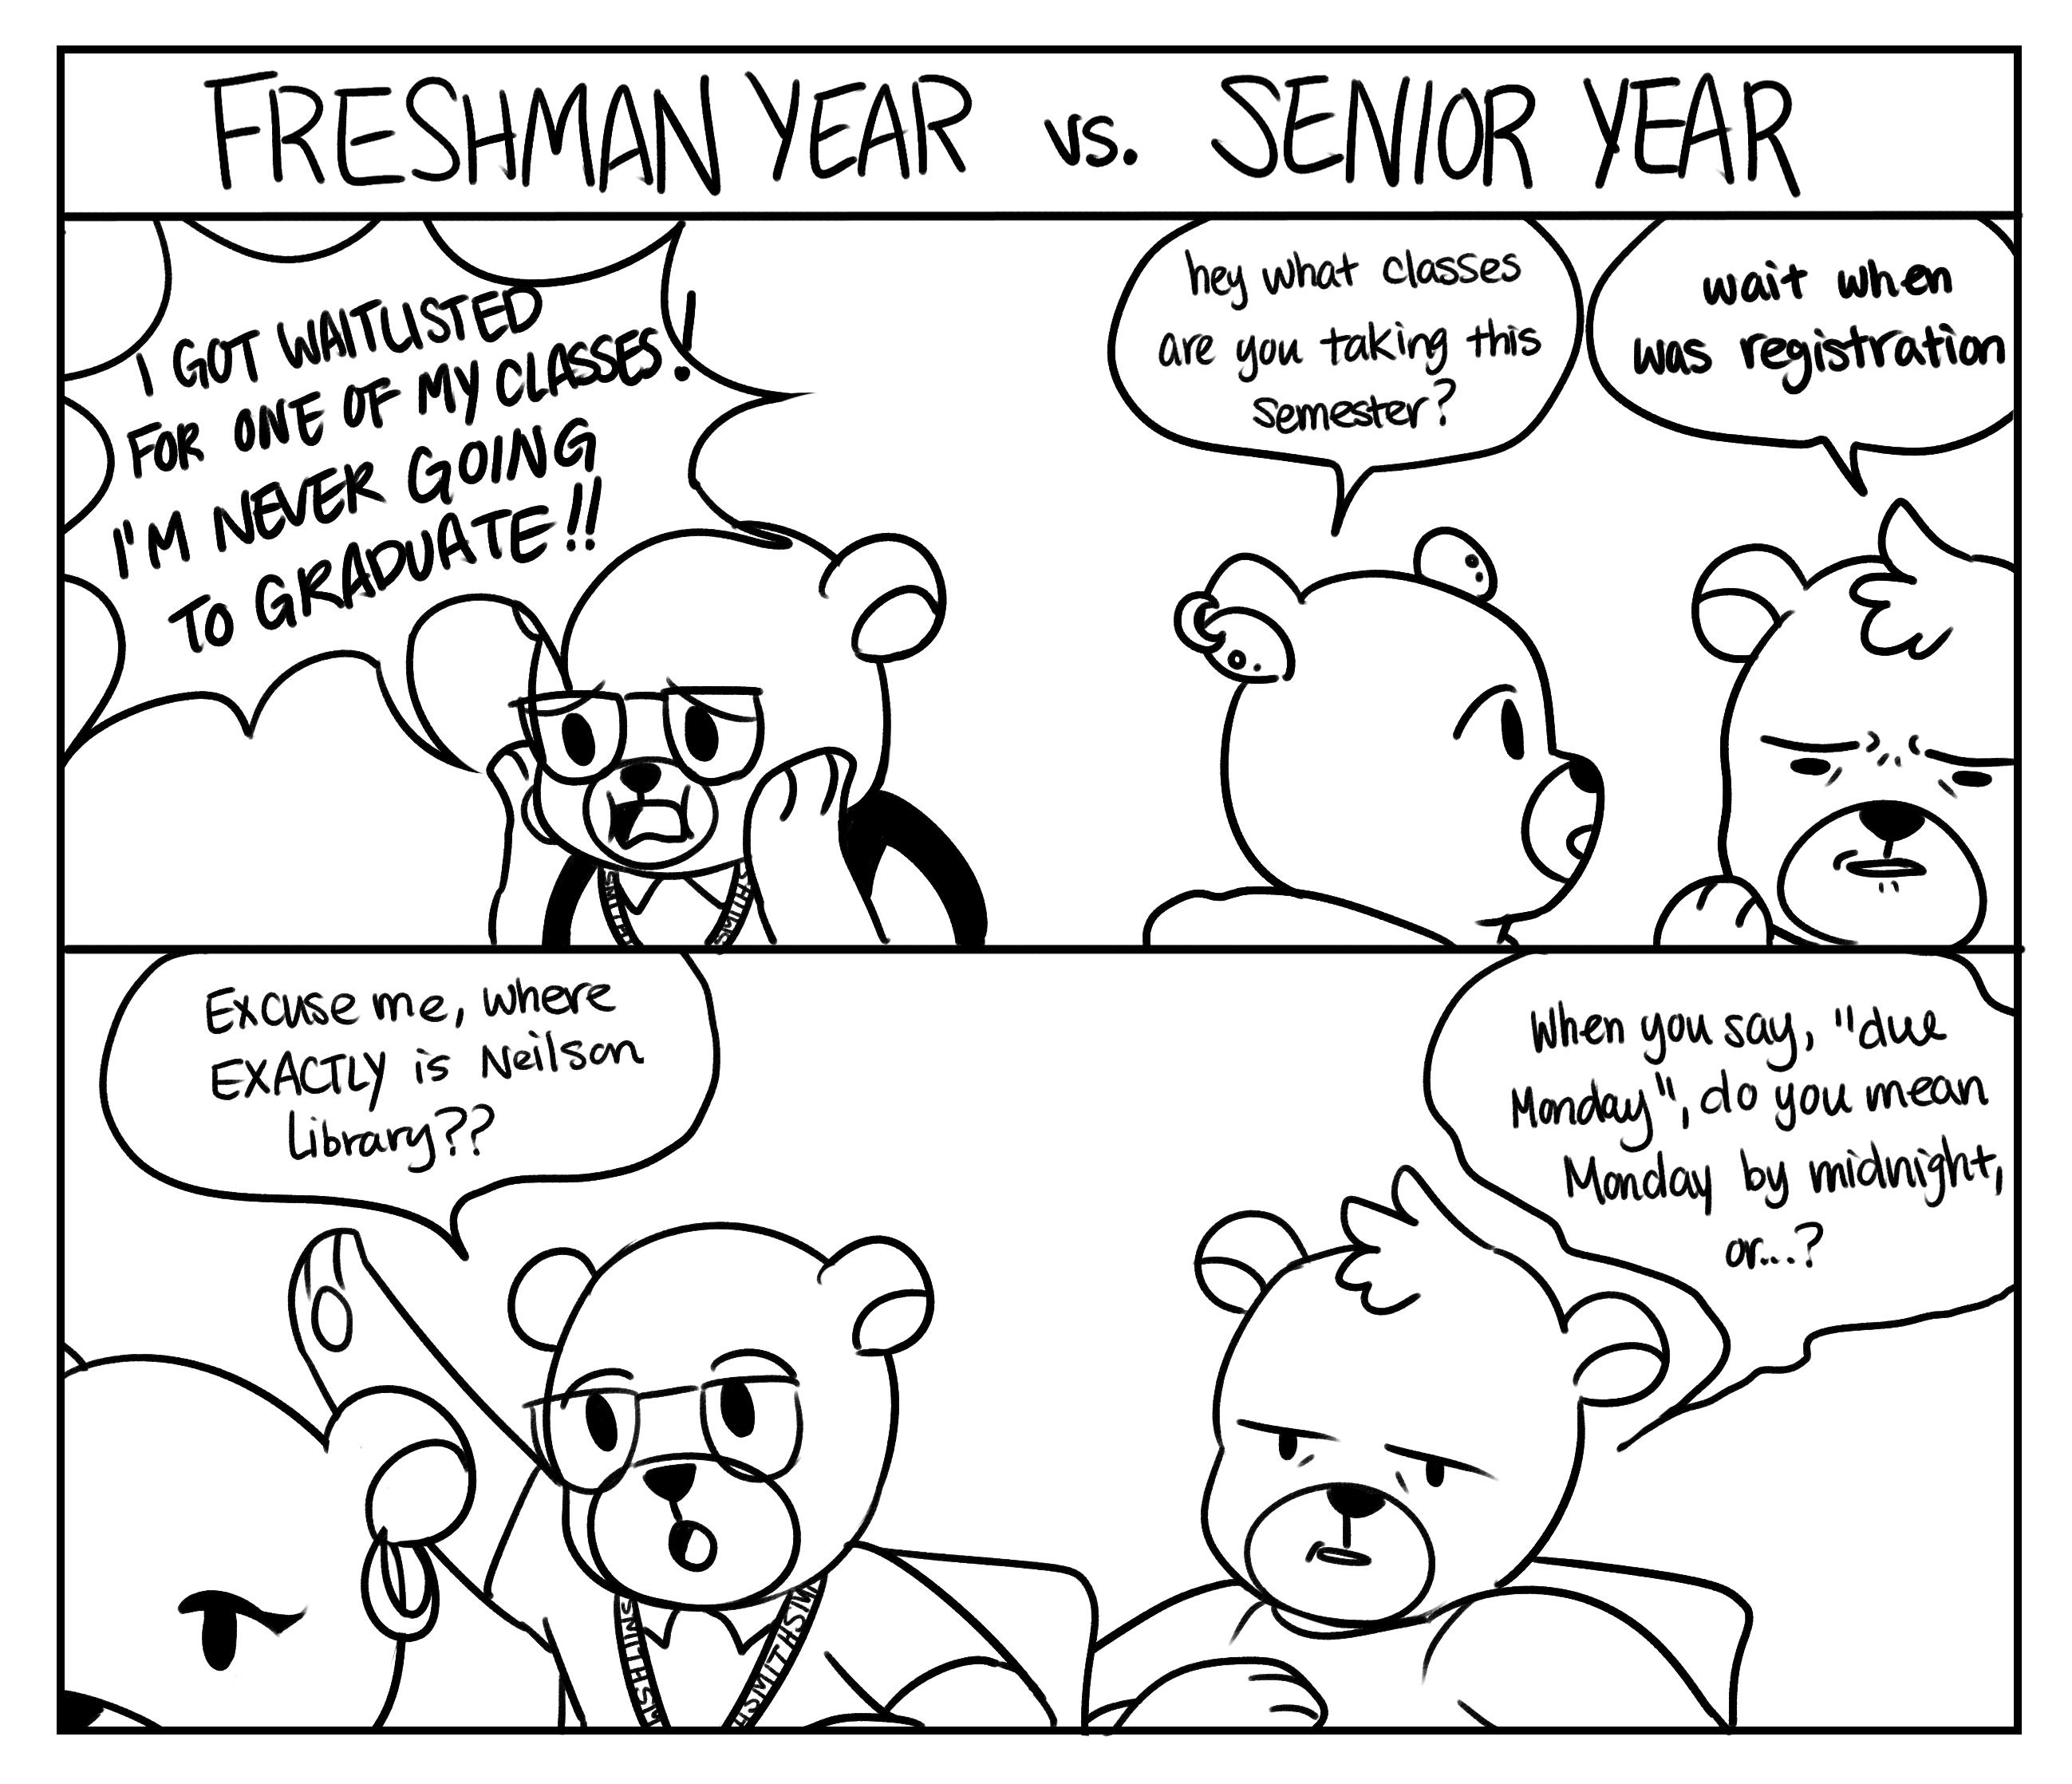 2597x2236 Weekly Comic Freshman Year Vs. Senior Year